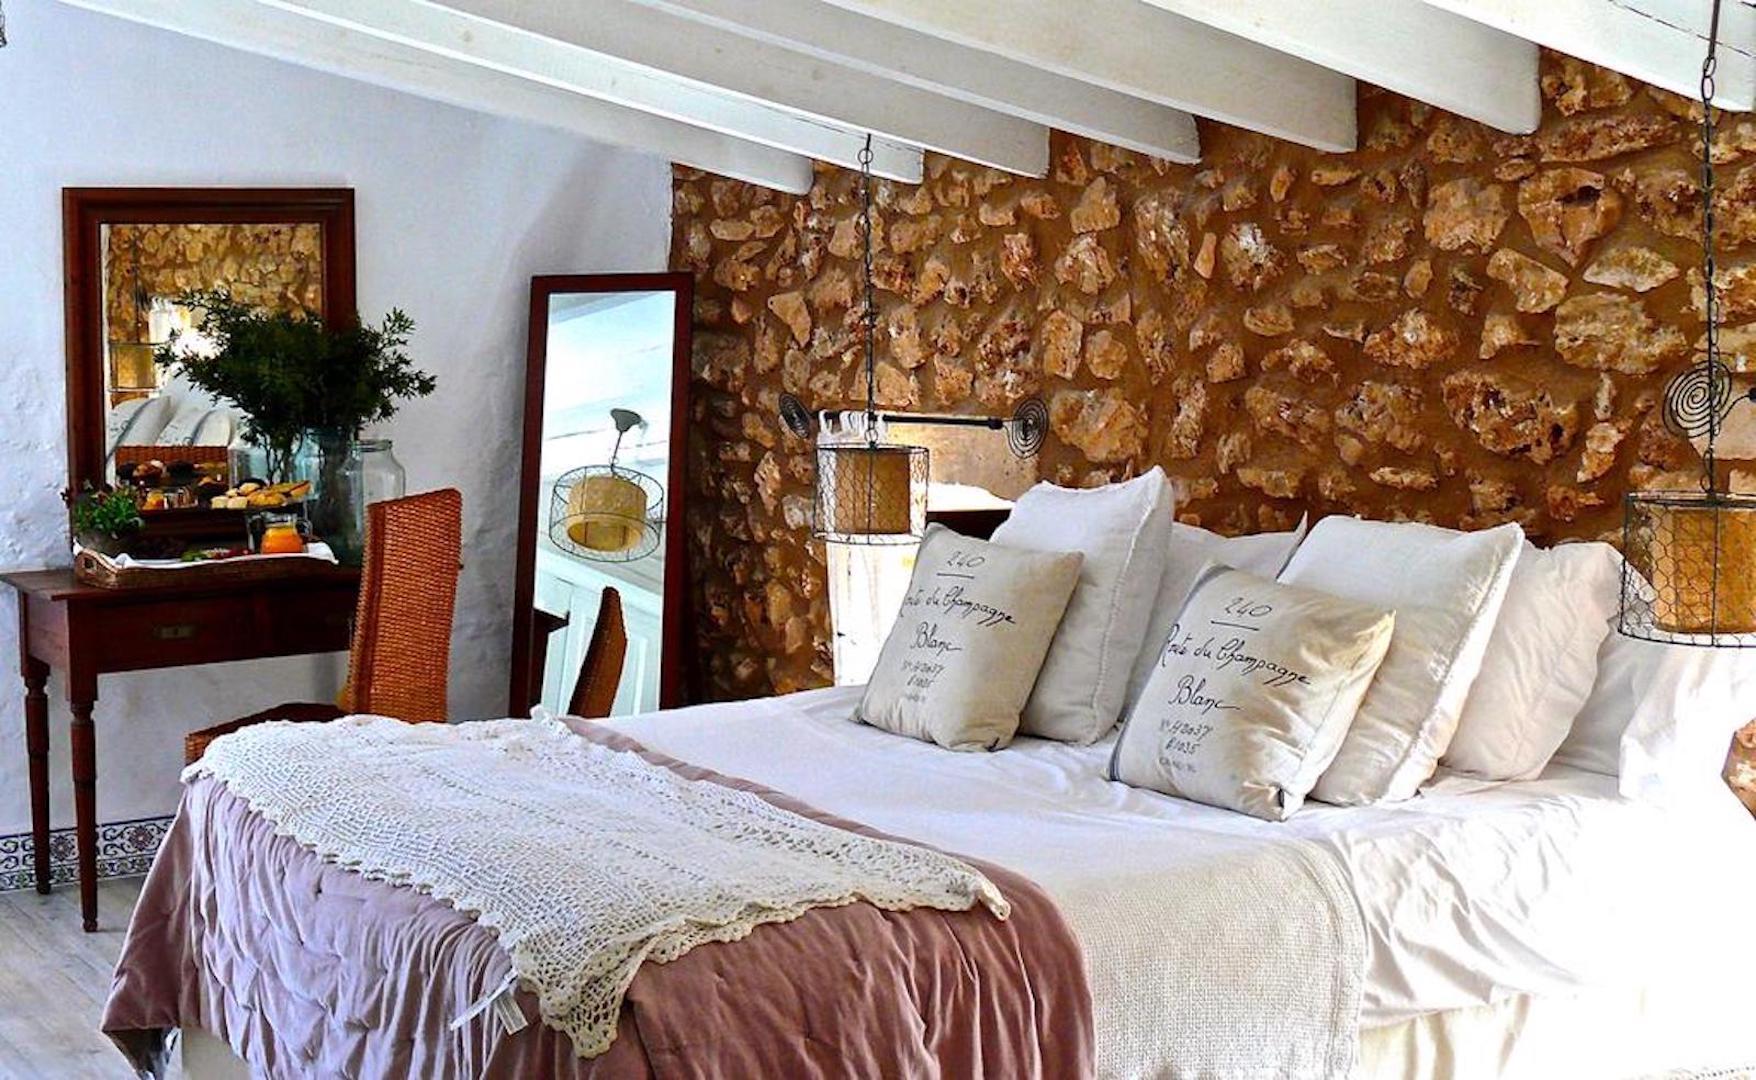 ISLA-Travel-Finca-Hotel-Es-Turo-Doppelzimmer